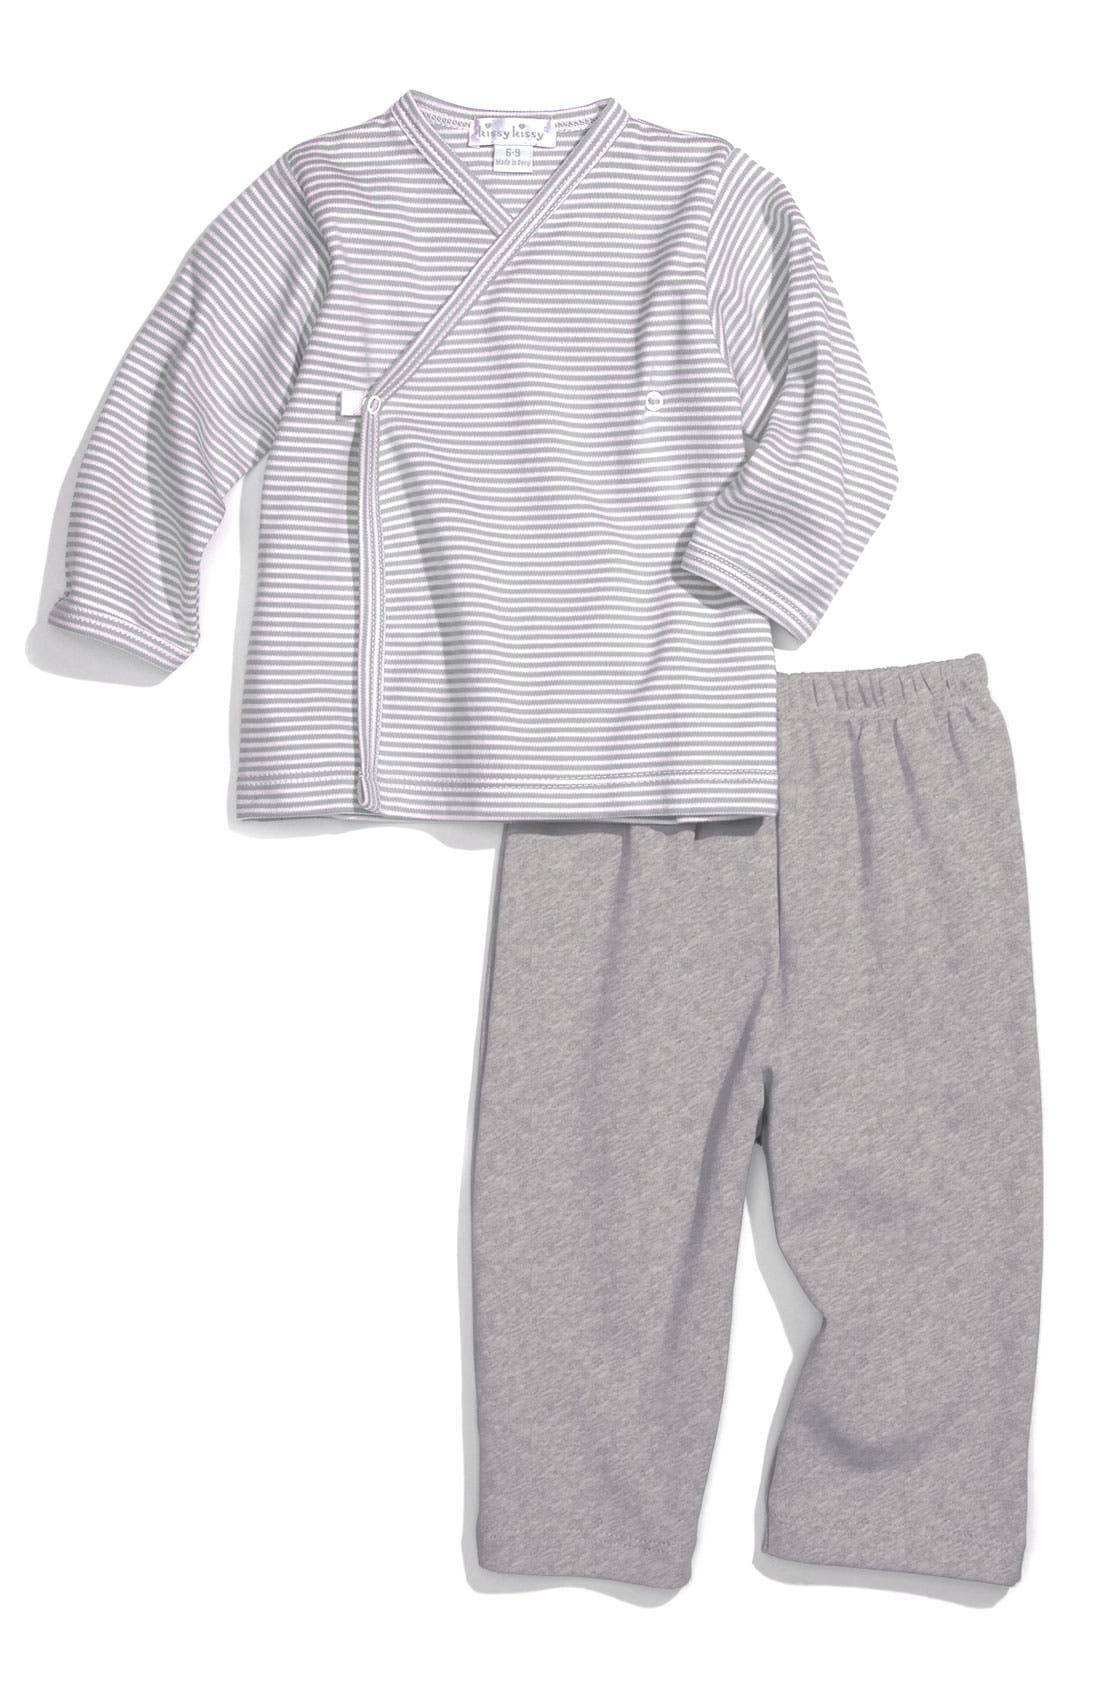 Alternate Image 1 Selected - Kissy Kissy Top & Pants Set (Infant)